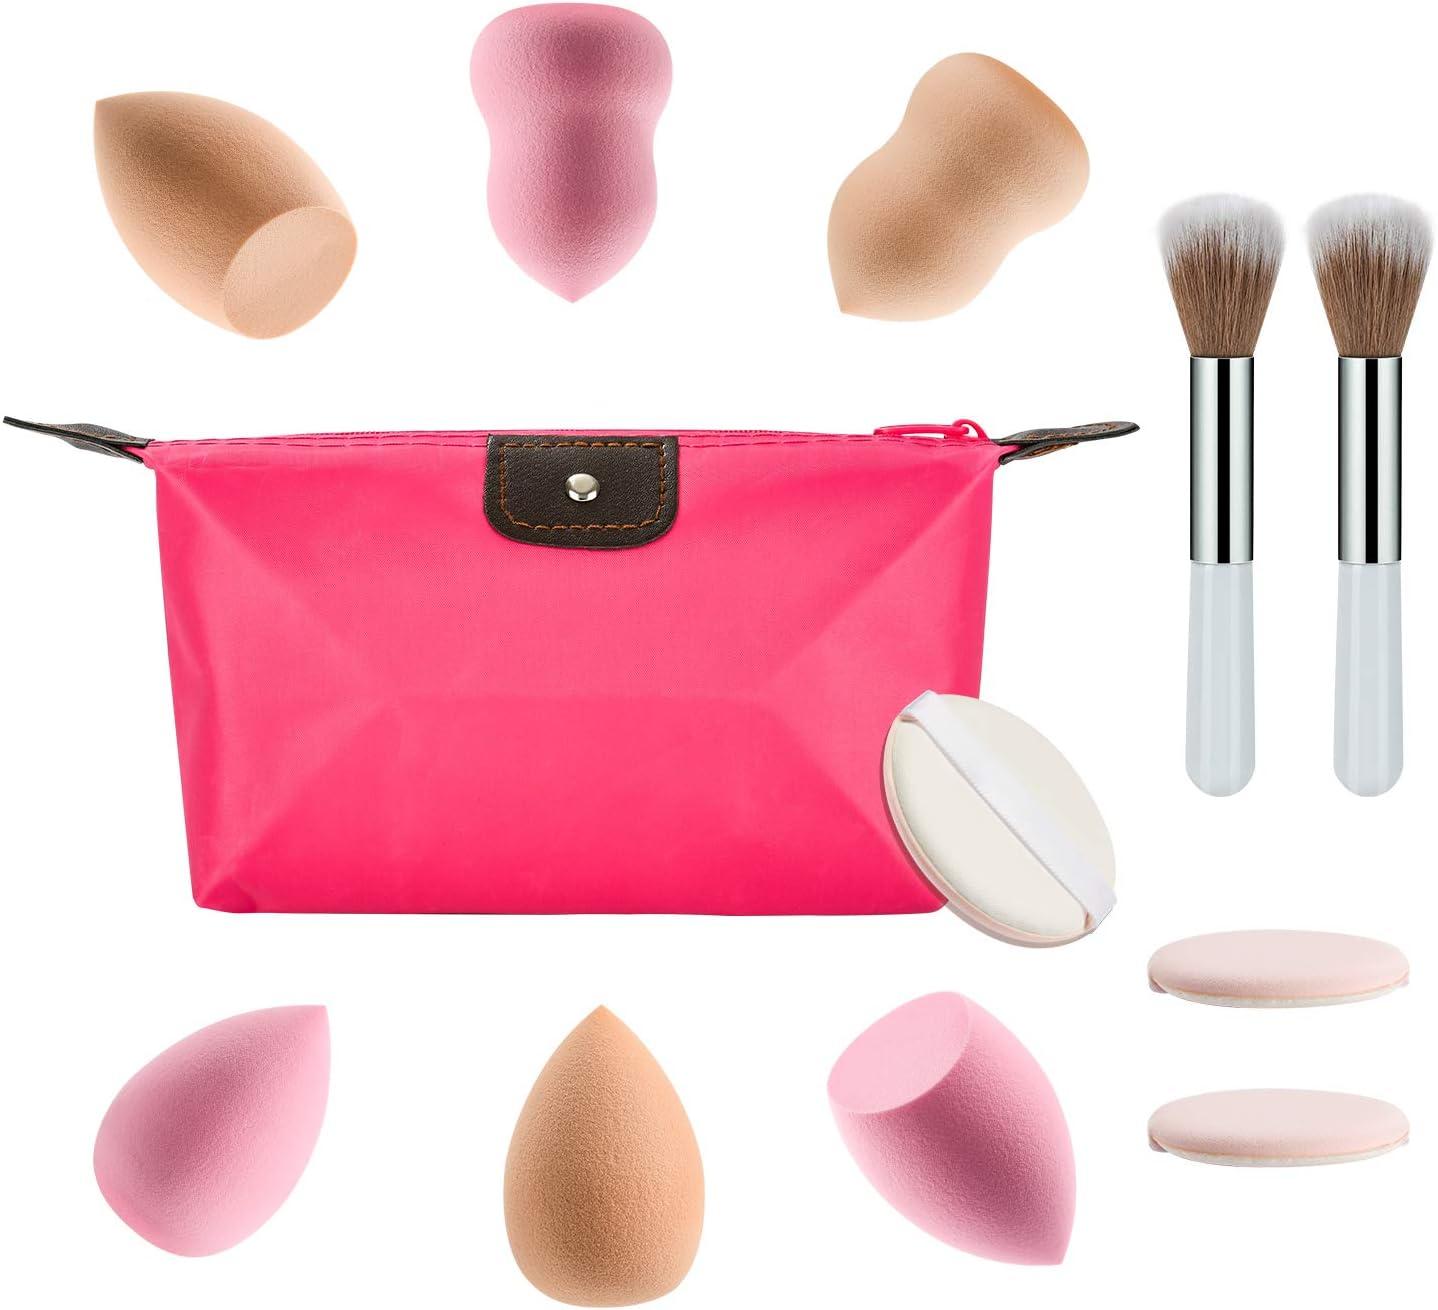 Cosmetics Beauty Sponge Blender, Makeup Egg Sponge, Powder Puffs, Cosmetic Brushes, Foundation Blending Applicator Soft Sponge Cosmetic Puff Tool,Professional Beauty Make up Set (12 Pcs)Colors 1